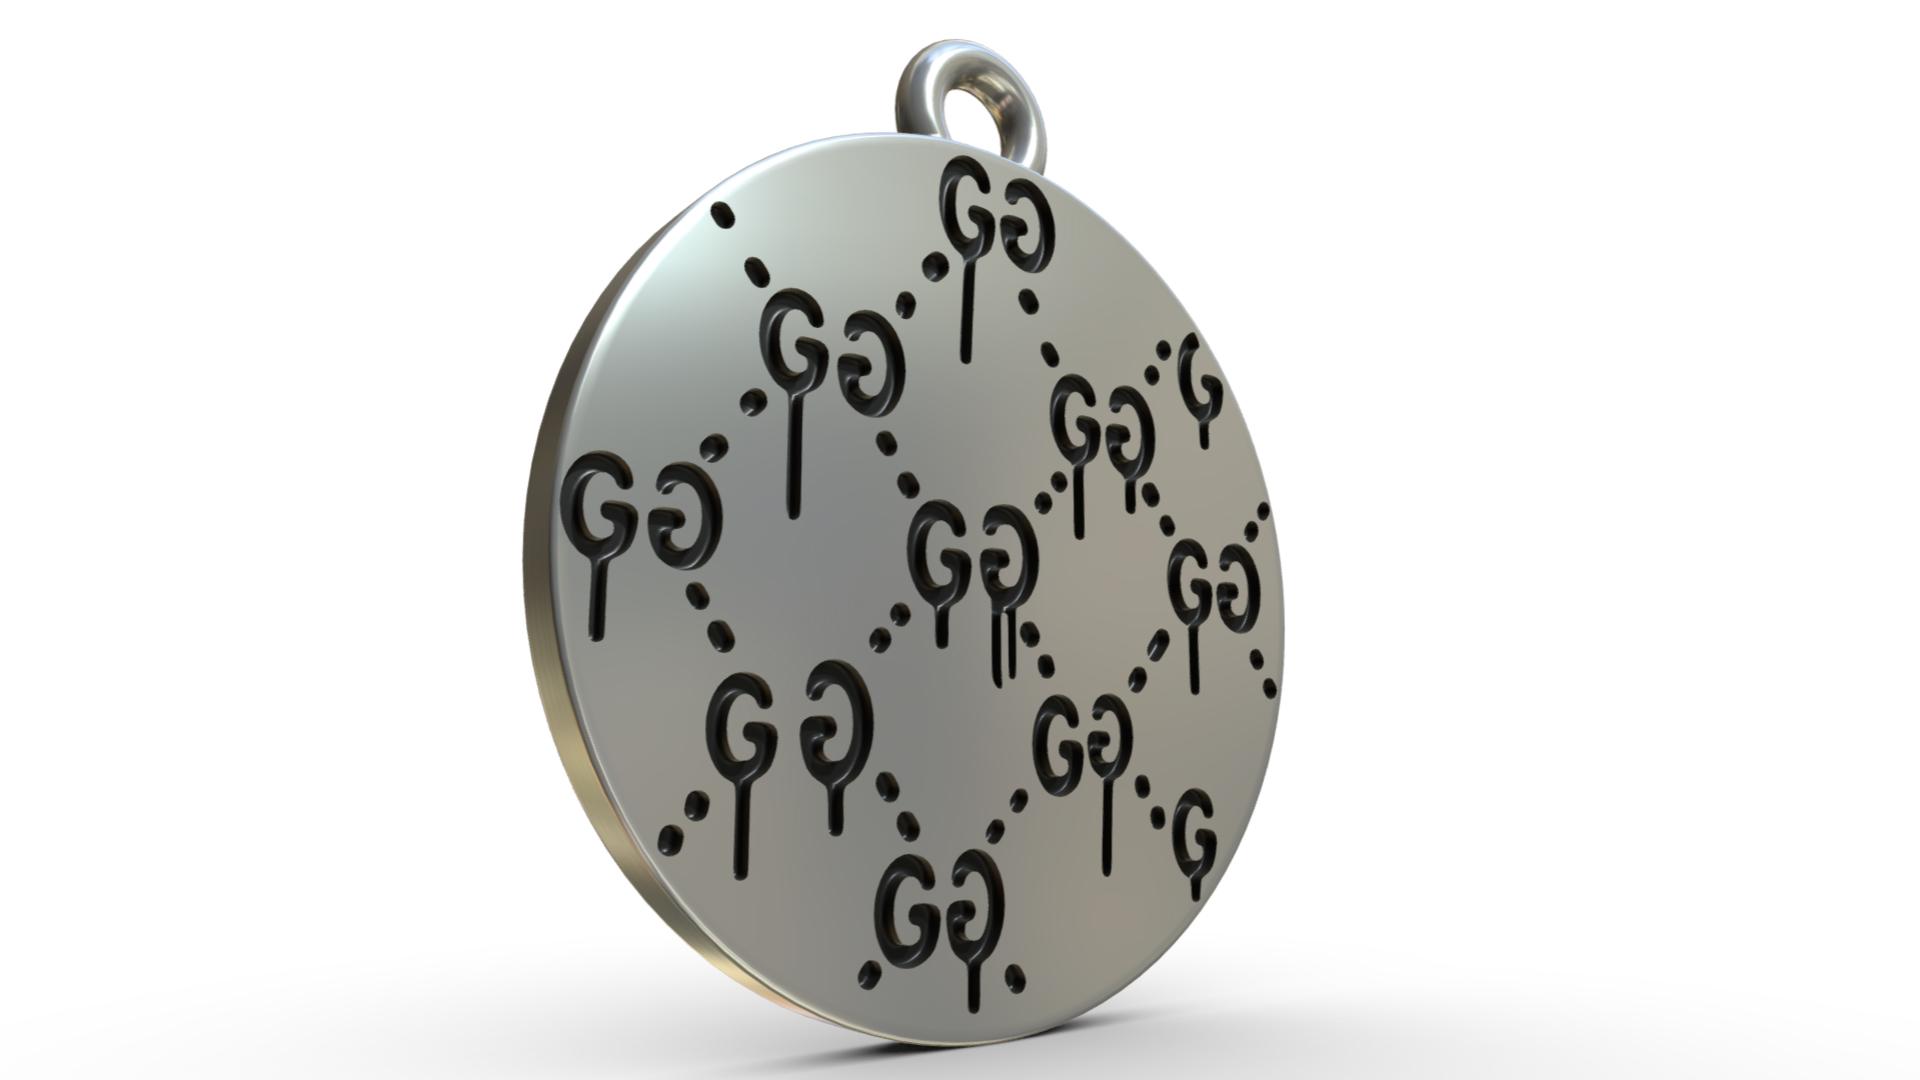 0650c1201 Gucci pendant - 3DOcean Item for Sale · 1.jpg 10.jpg 2.jpg 3.jpg 4.jpg  5.jpg 6.jpg 7.jpg ...